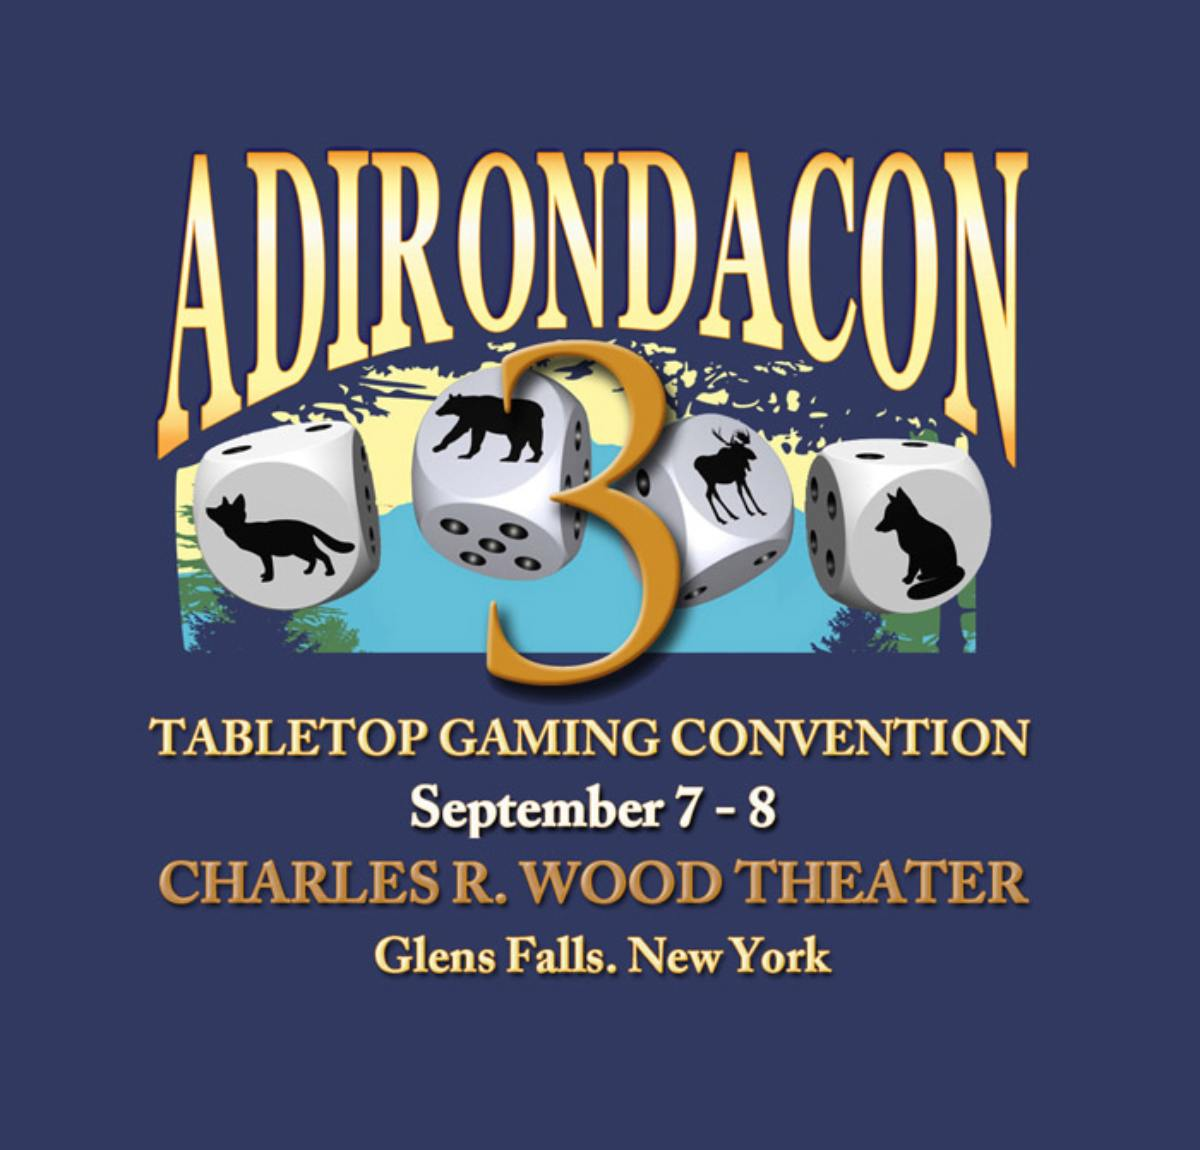 poster for adirondacon 3